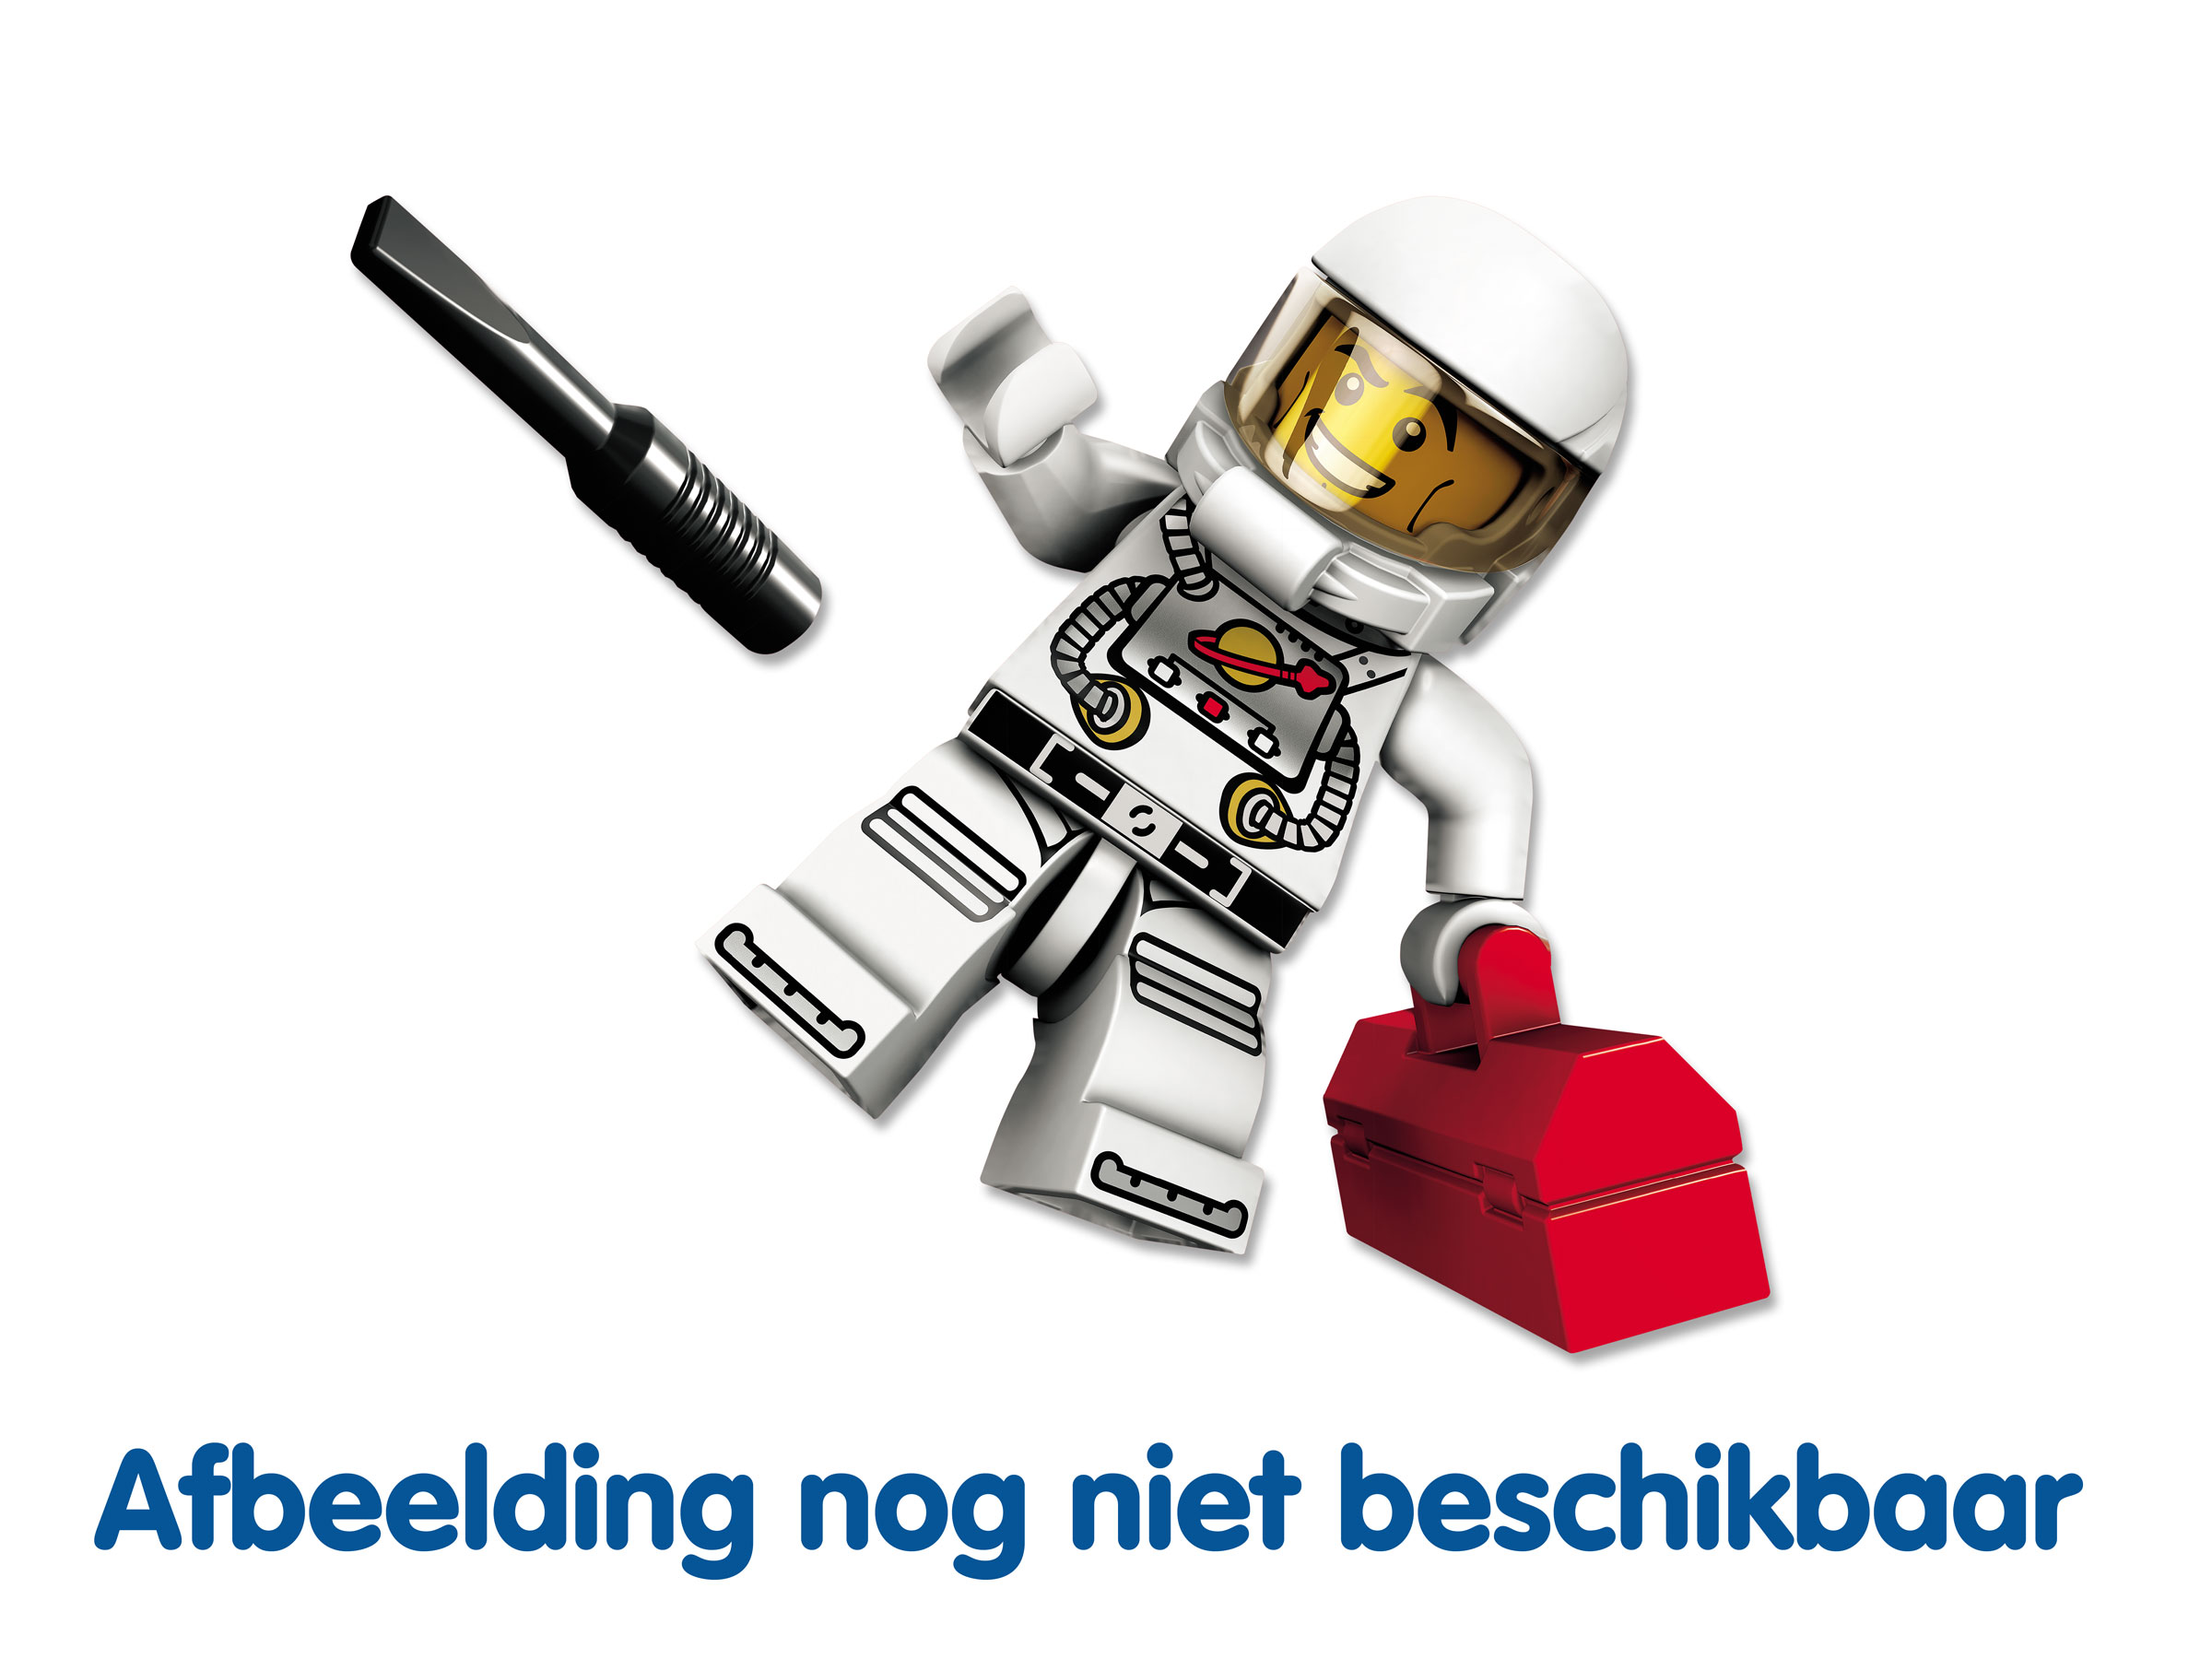 MisterBricks LEGO sign